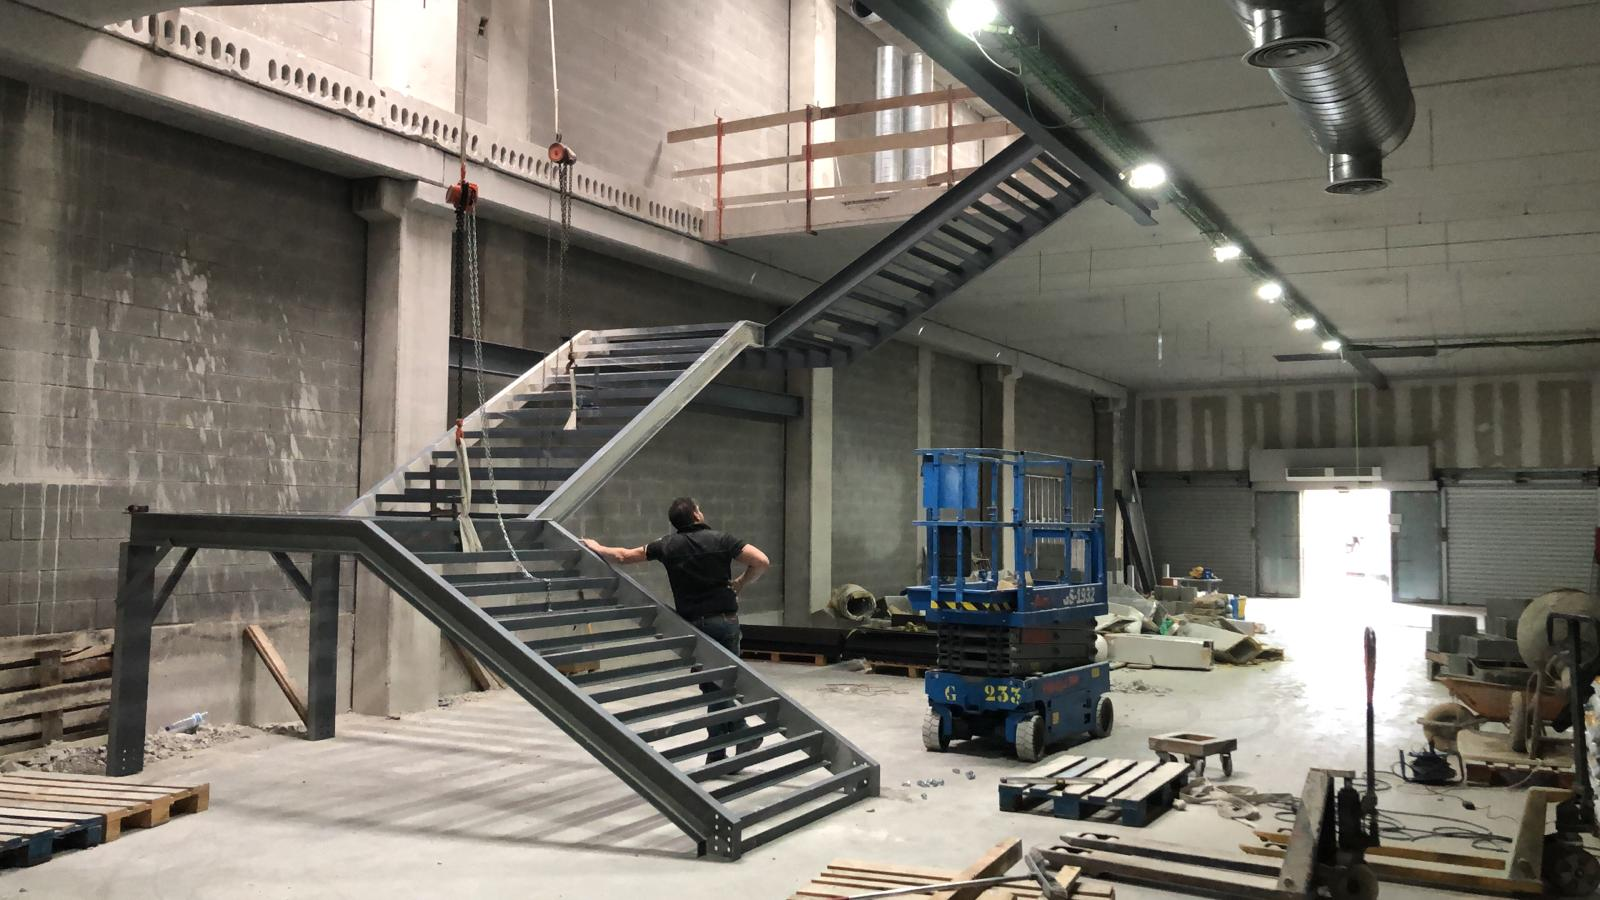 Escalera flotante Motocard obras 4